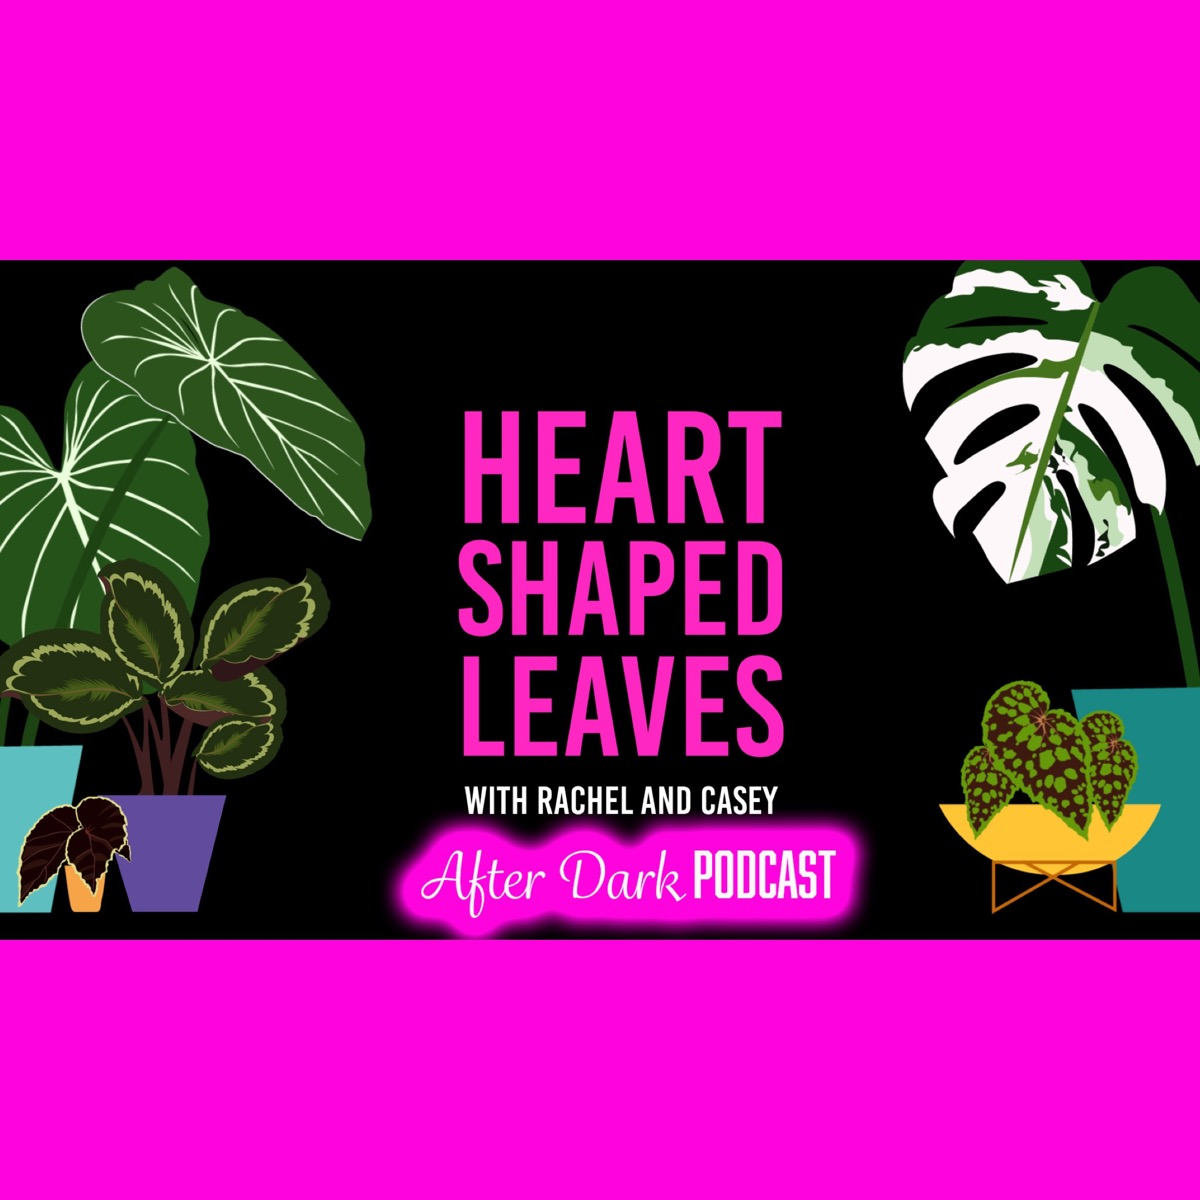 Heart Shaped Leaves After Dark Podcast | Lyssna här